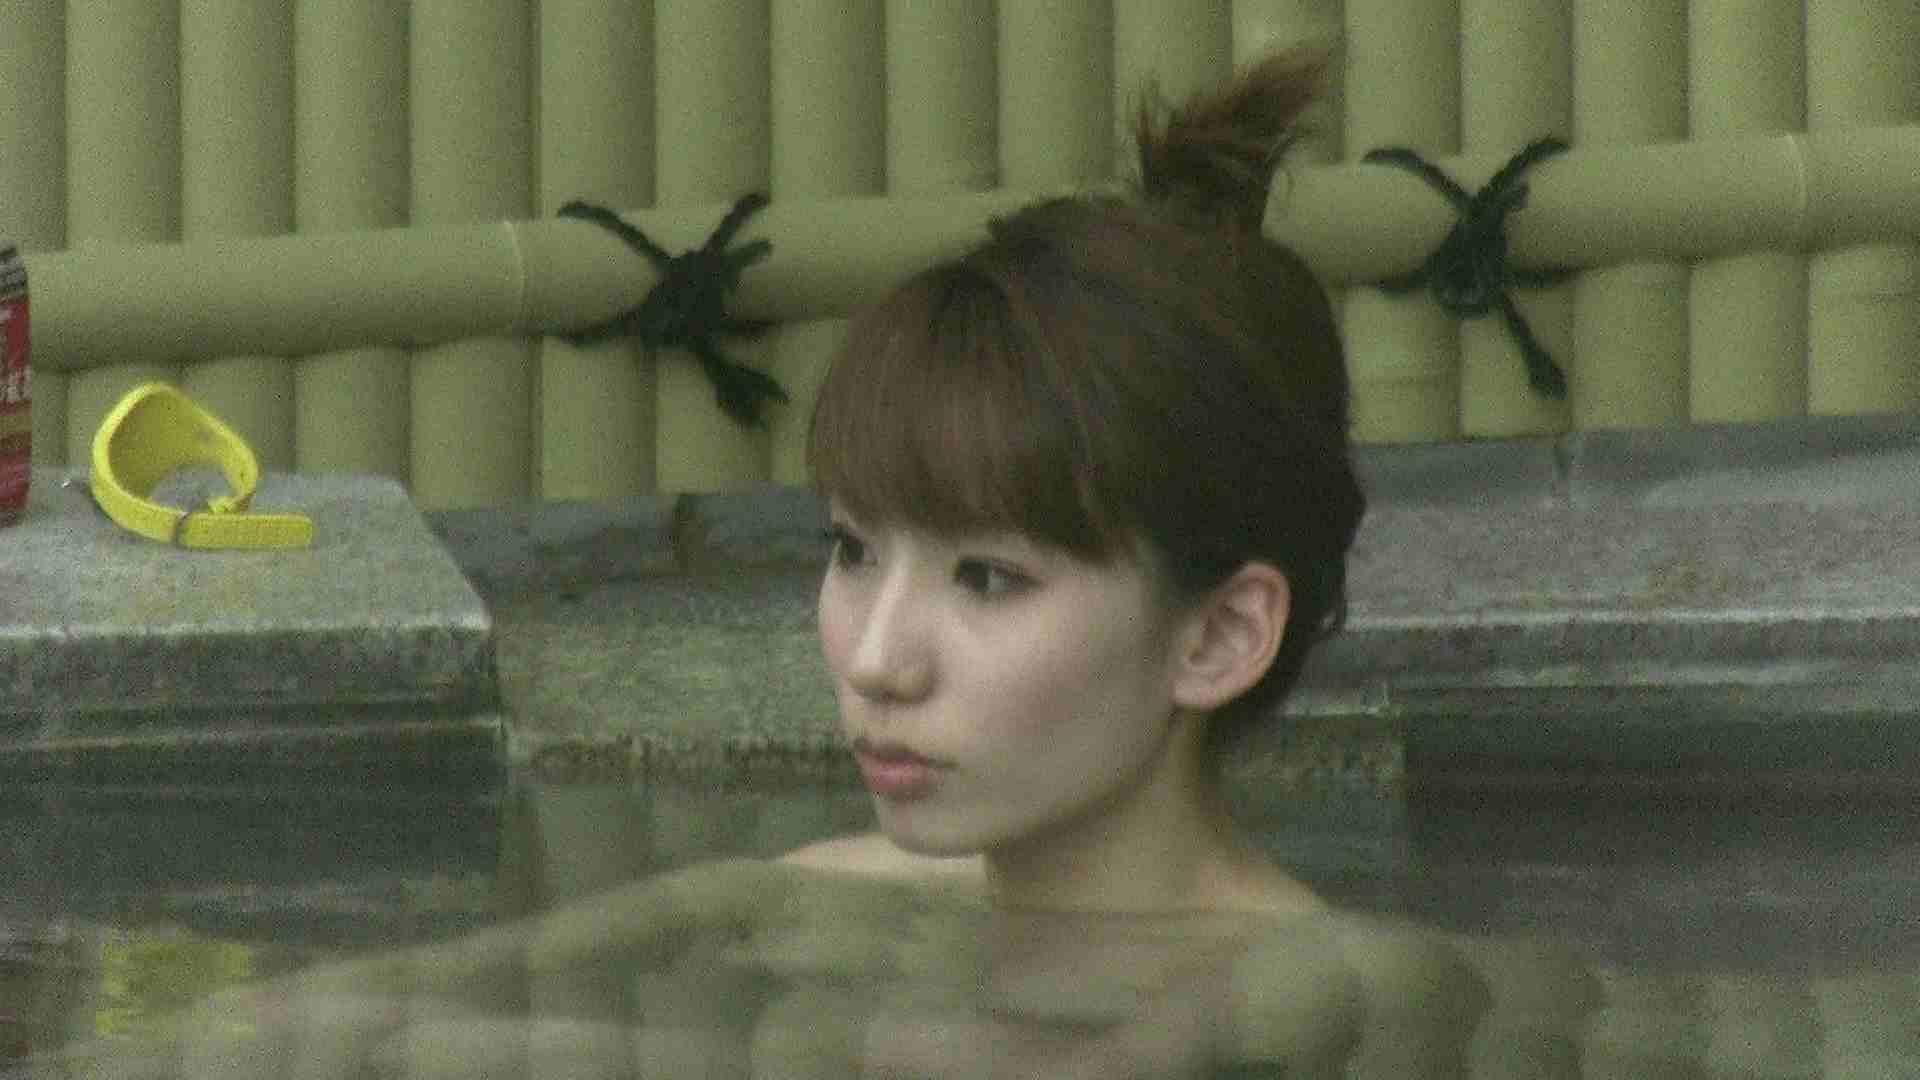 Aquaな露天風呂Vol.208 露天風呂編 | 盗撮シリーズ  103PIX 35